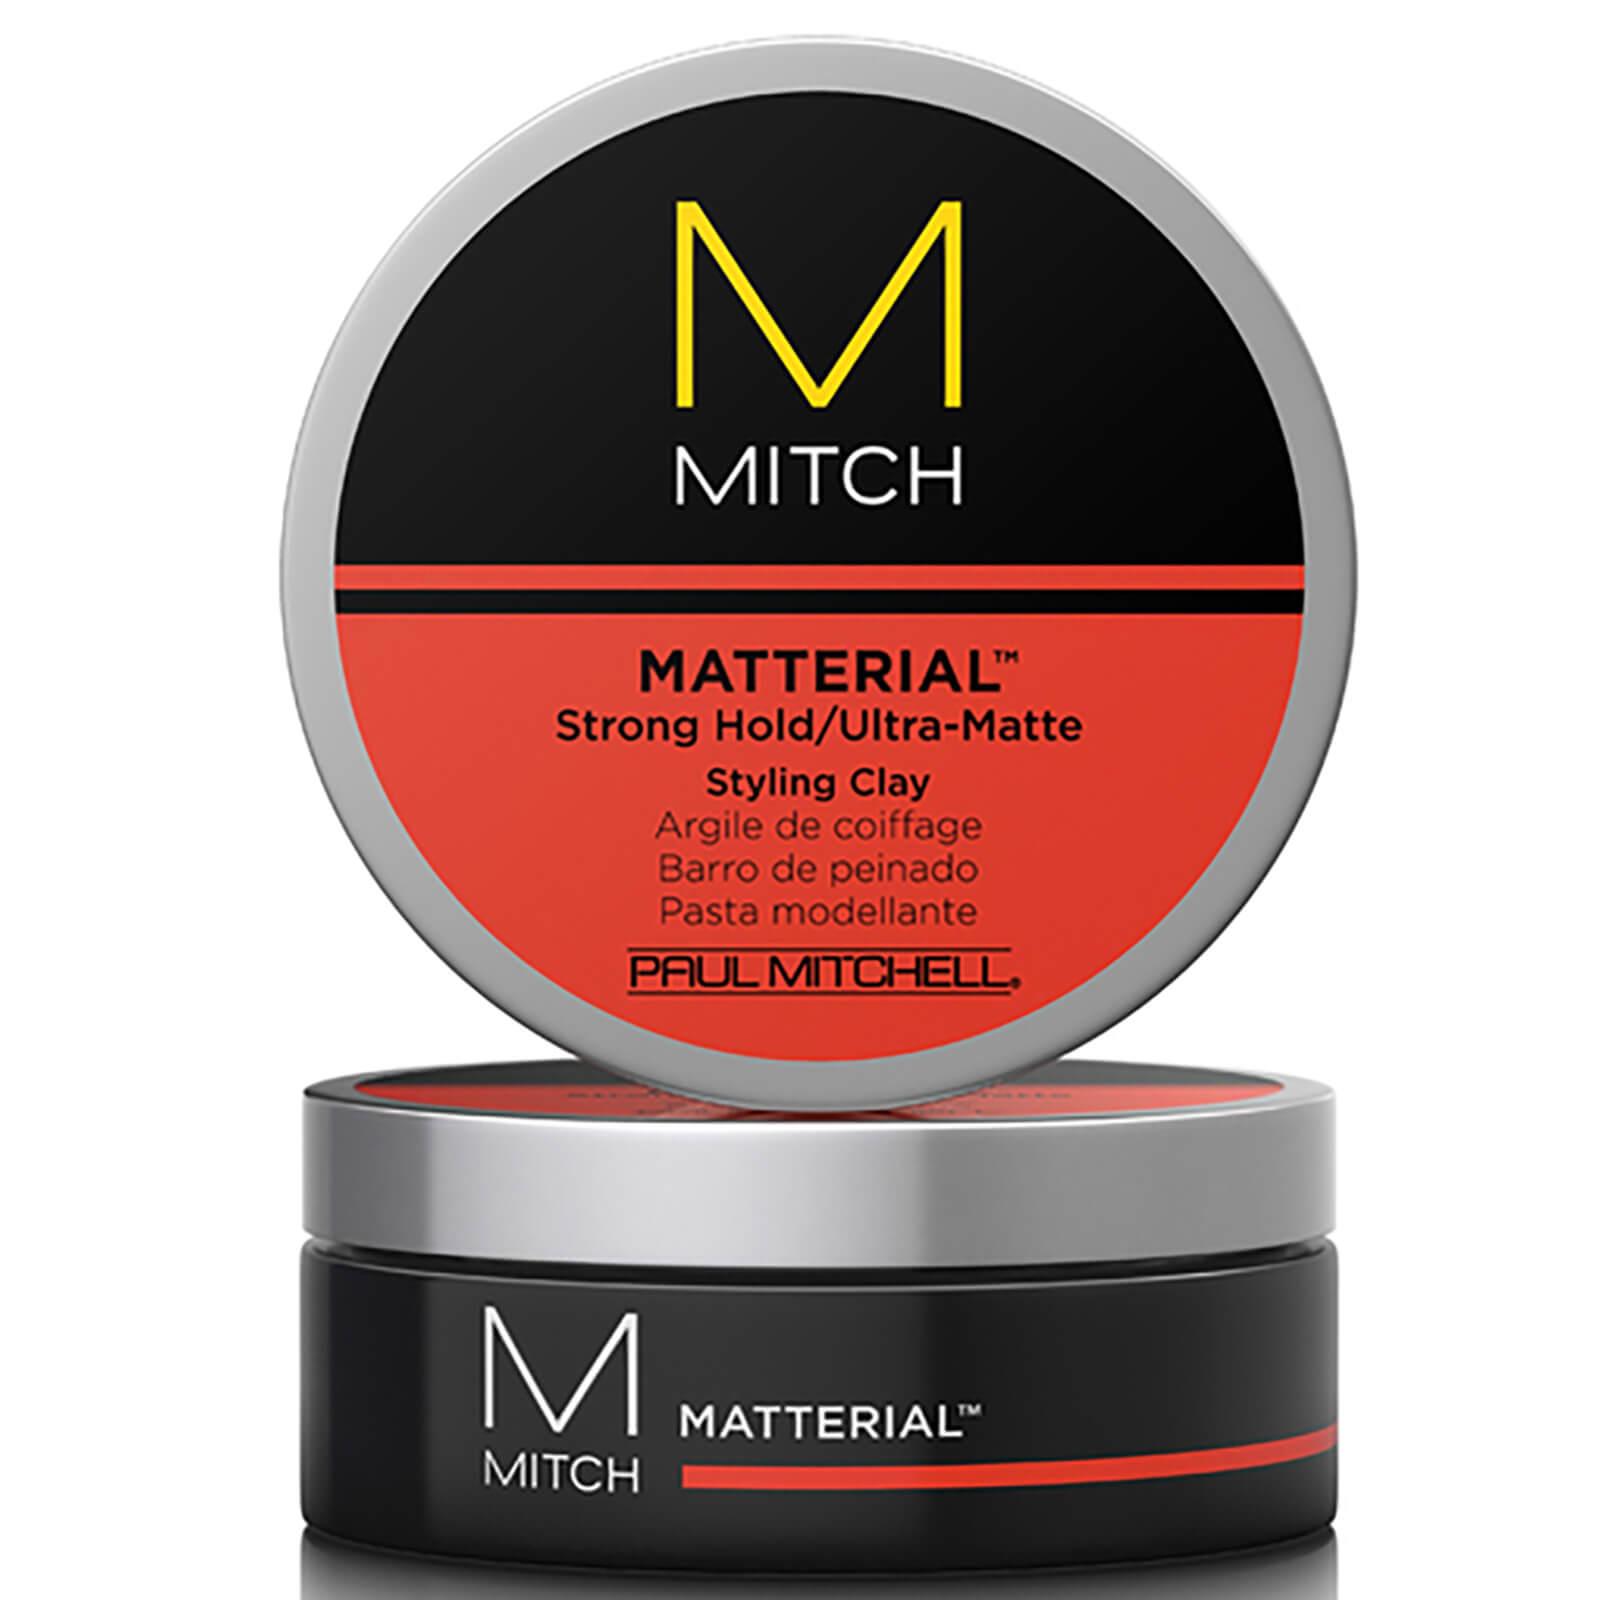 Mitch Matterial >> Paul Mitchell Mitch Matterial Ultra Matte Styling Clay 85g Free